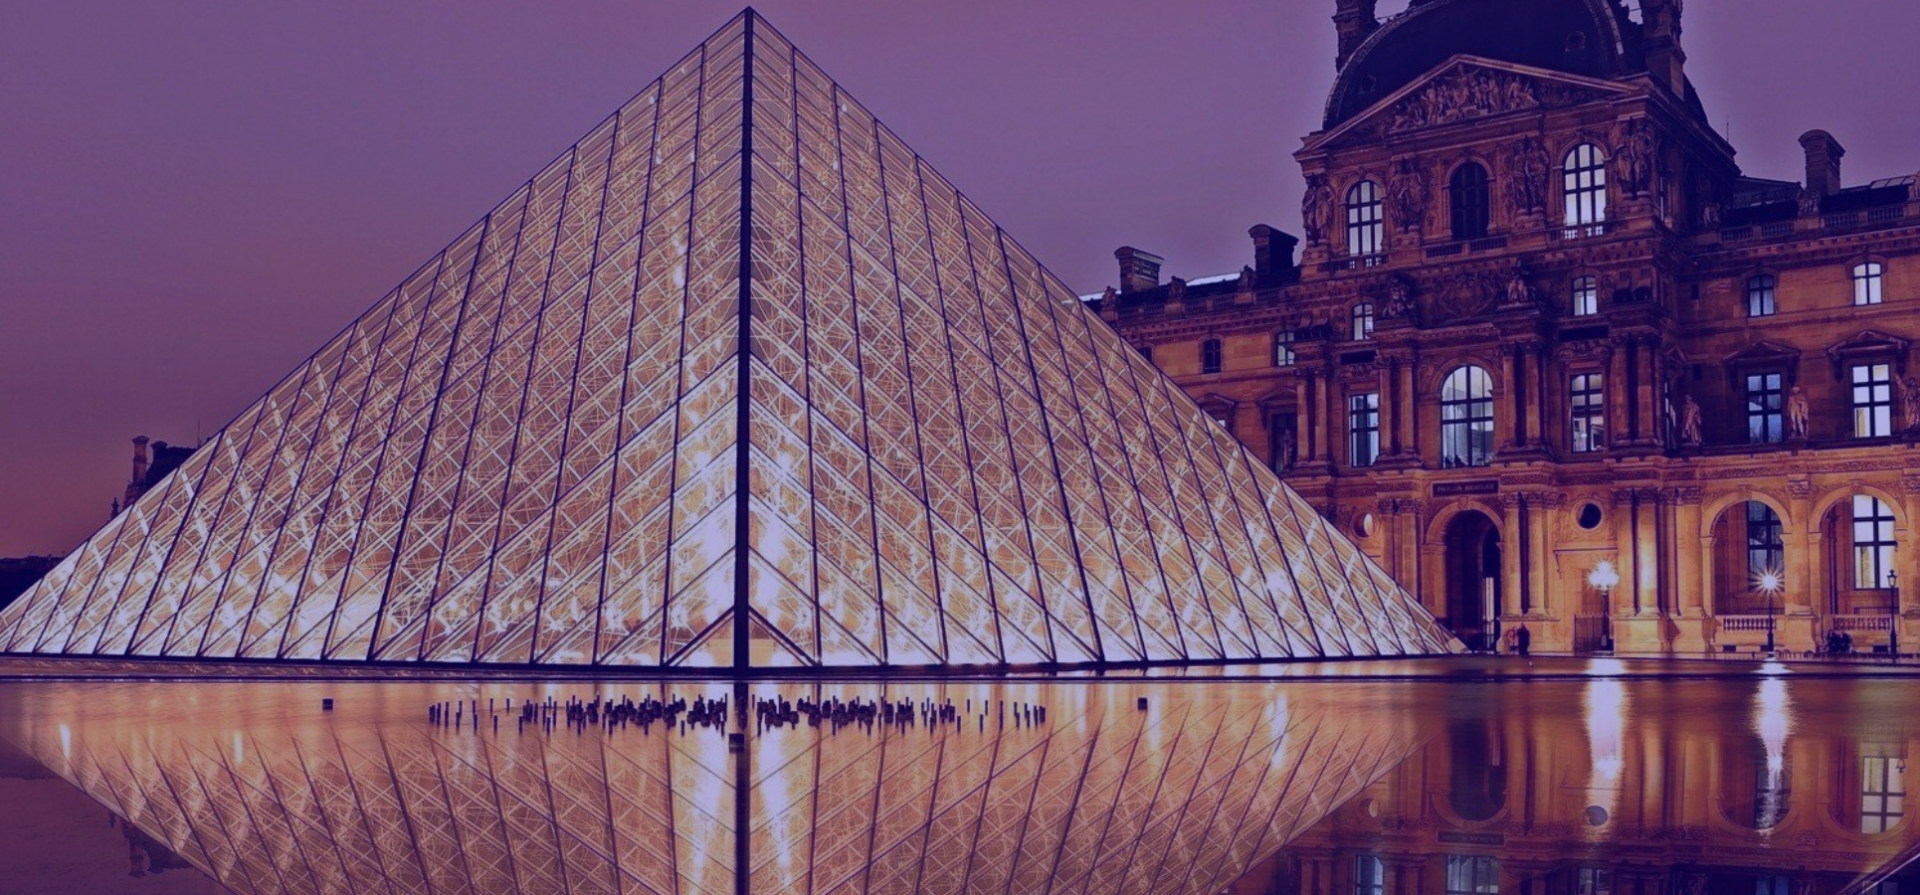 Curiosidades sobre o Louvre